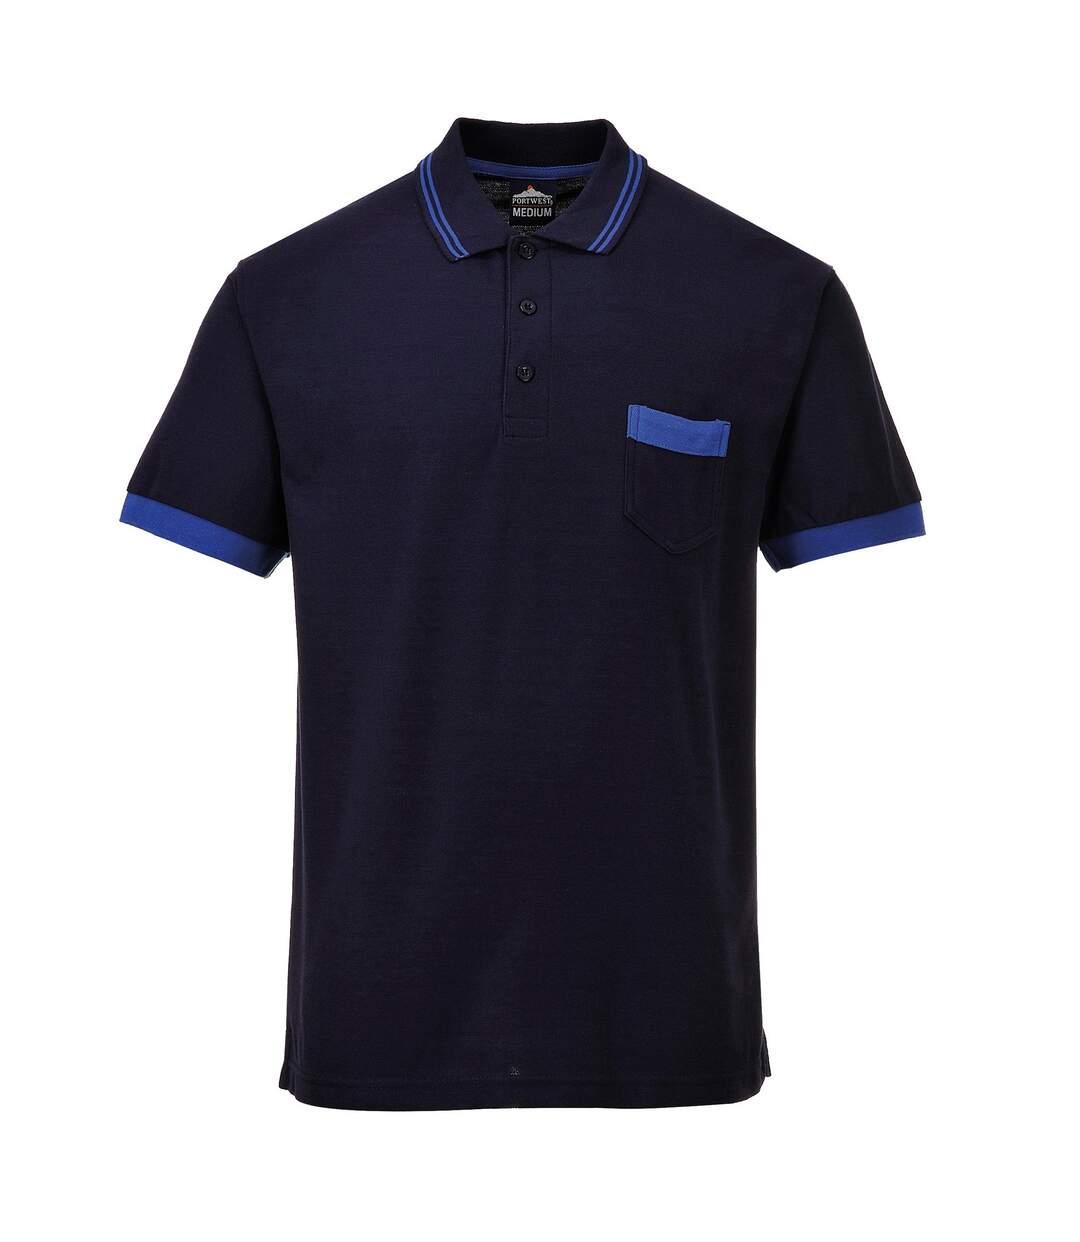 Portwest Mens Texo Short Sleeve Contrast Polo Shirt (Navy/ Royal) - UTRW5443